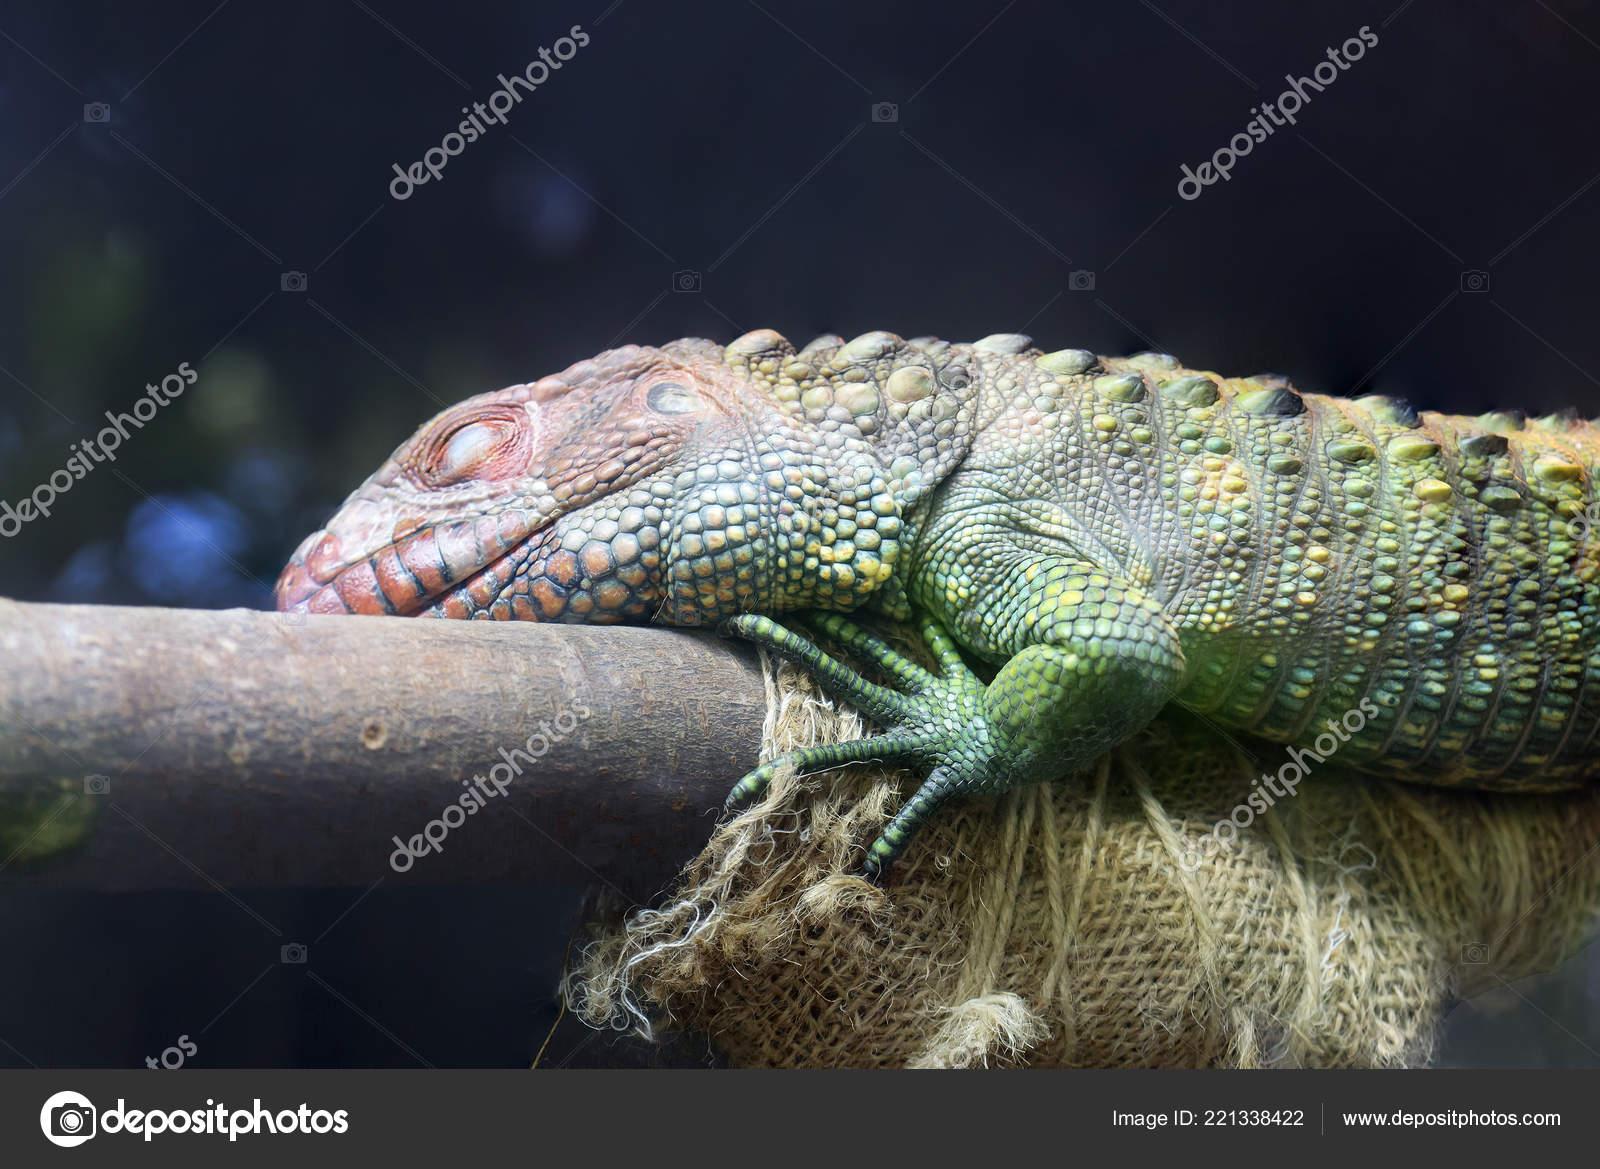 Northern Cayman Lizard Caiman Lizard Species Large Semi